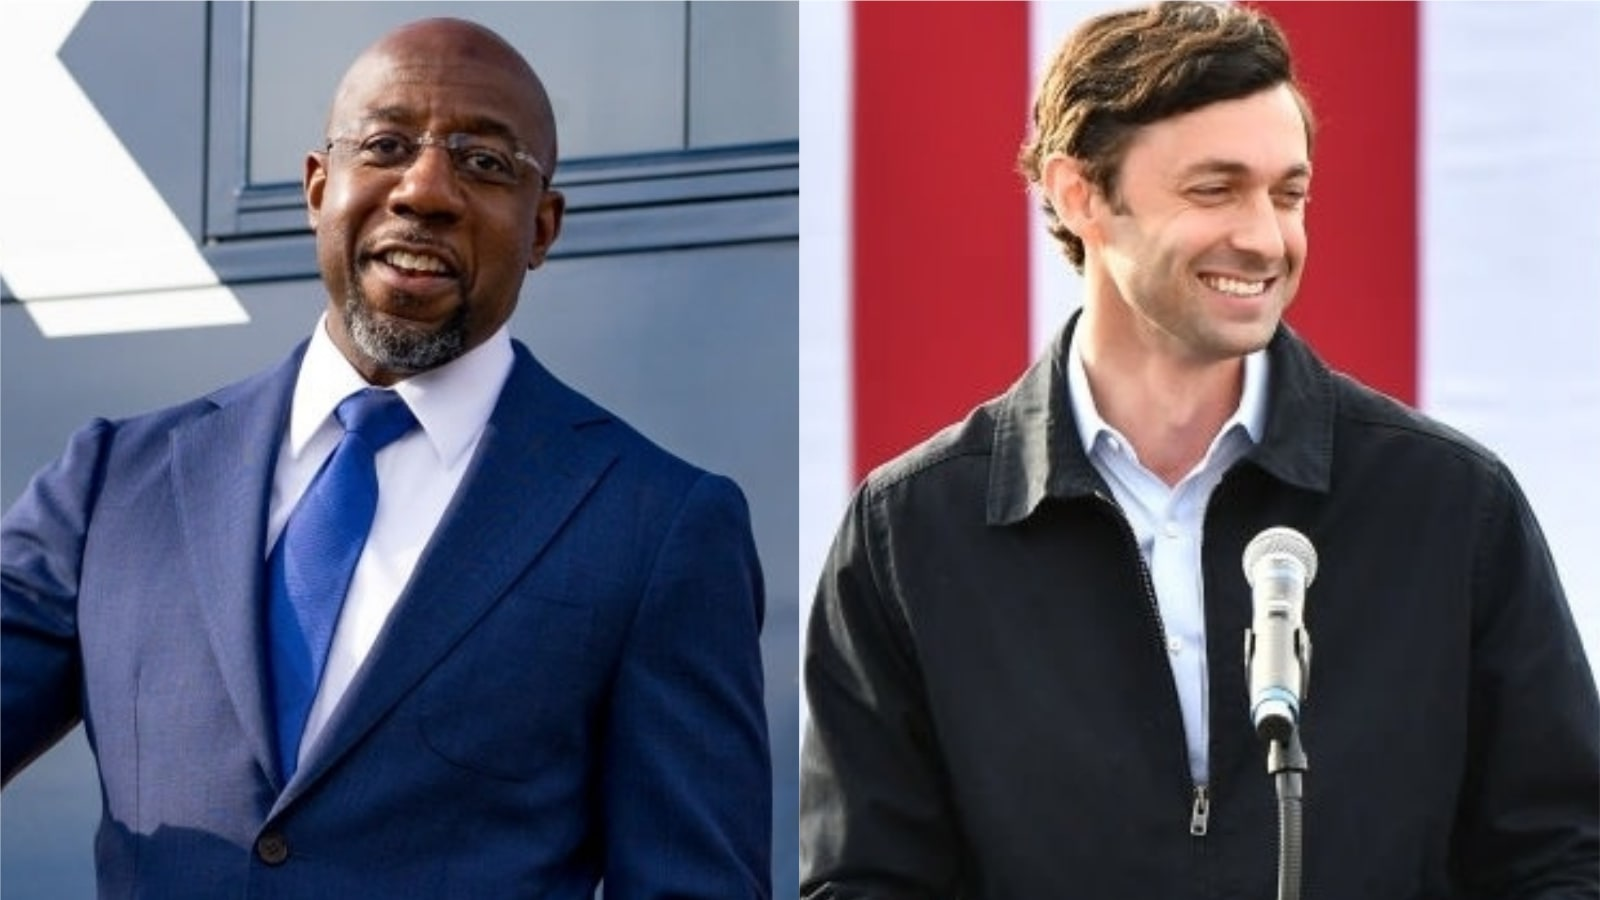 Sens. Jon Ossoff And Raphael Warnock Secure More Than $84 Million For Georgia HBCUs